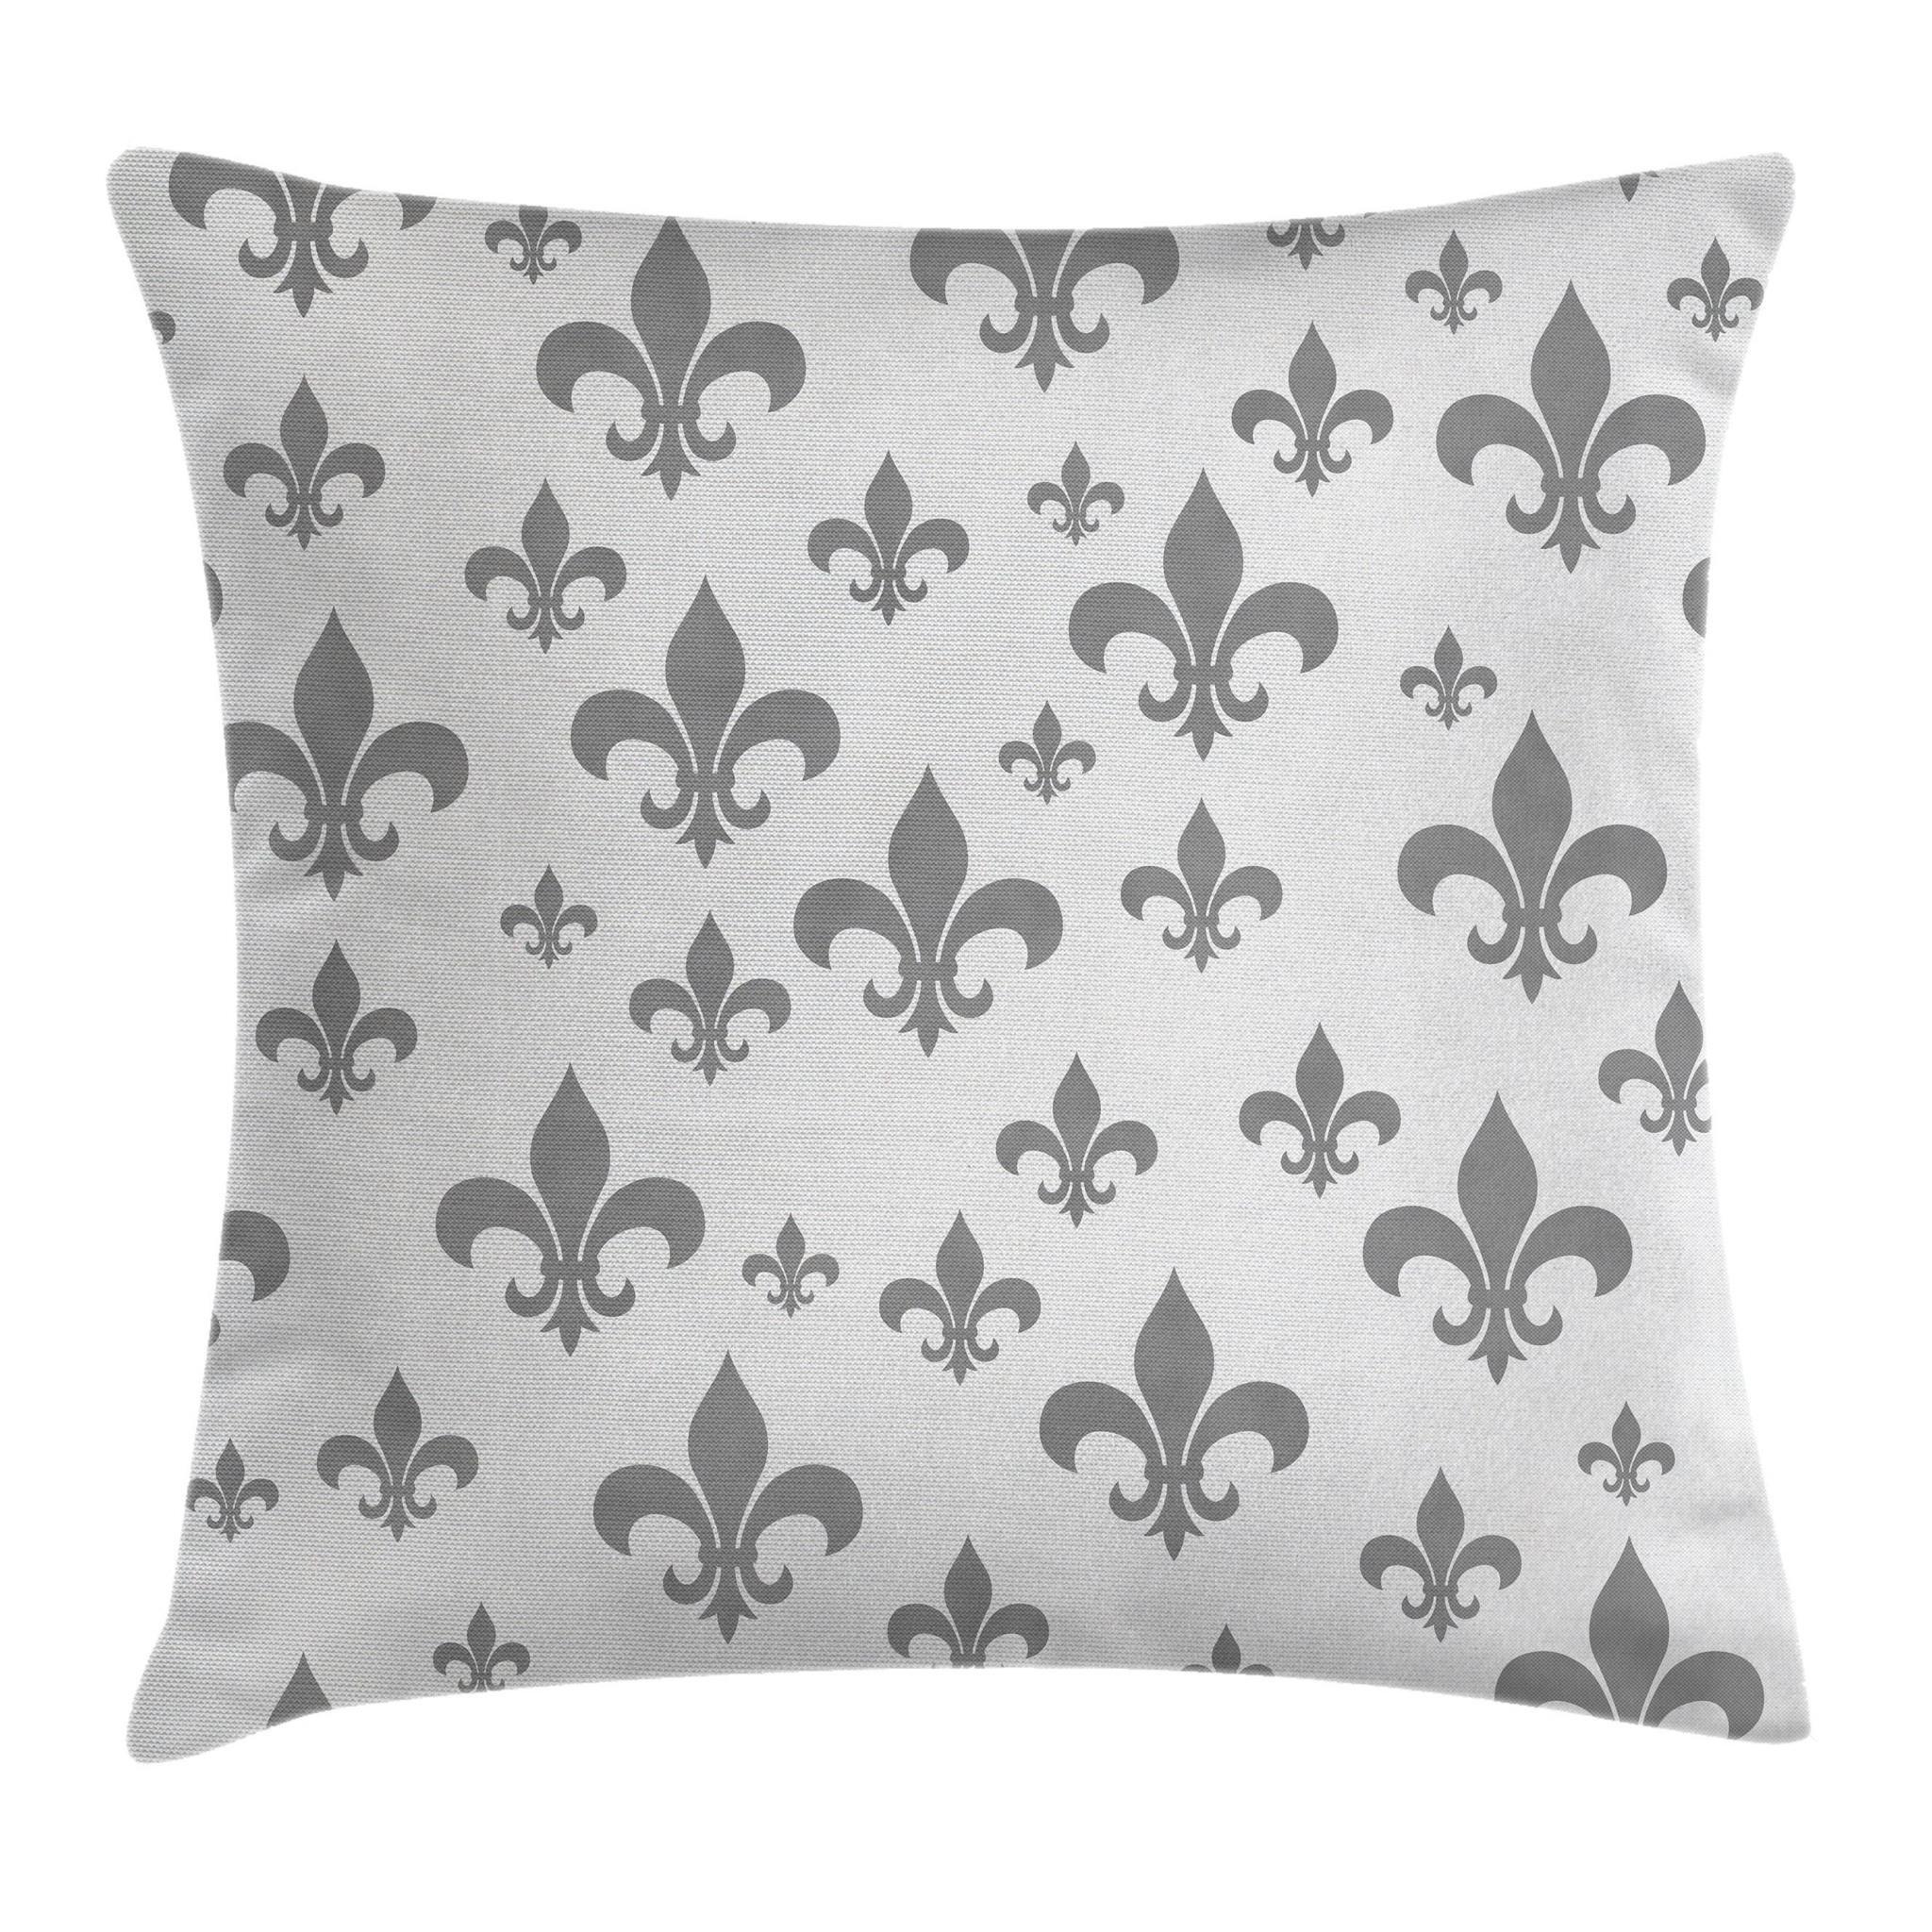 Ambesonne Fleur De Lis Throw Pillow Cushion Cover, Lily Pattern Classic Retro Royal Vintage European Iris Ornamental Artwork, Decorative Square Accent Pillow Case, 20'' X 20'', Grey